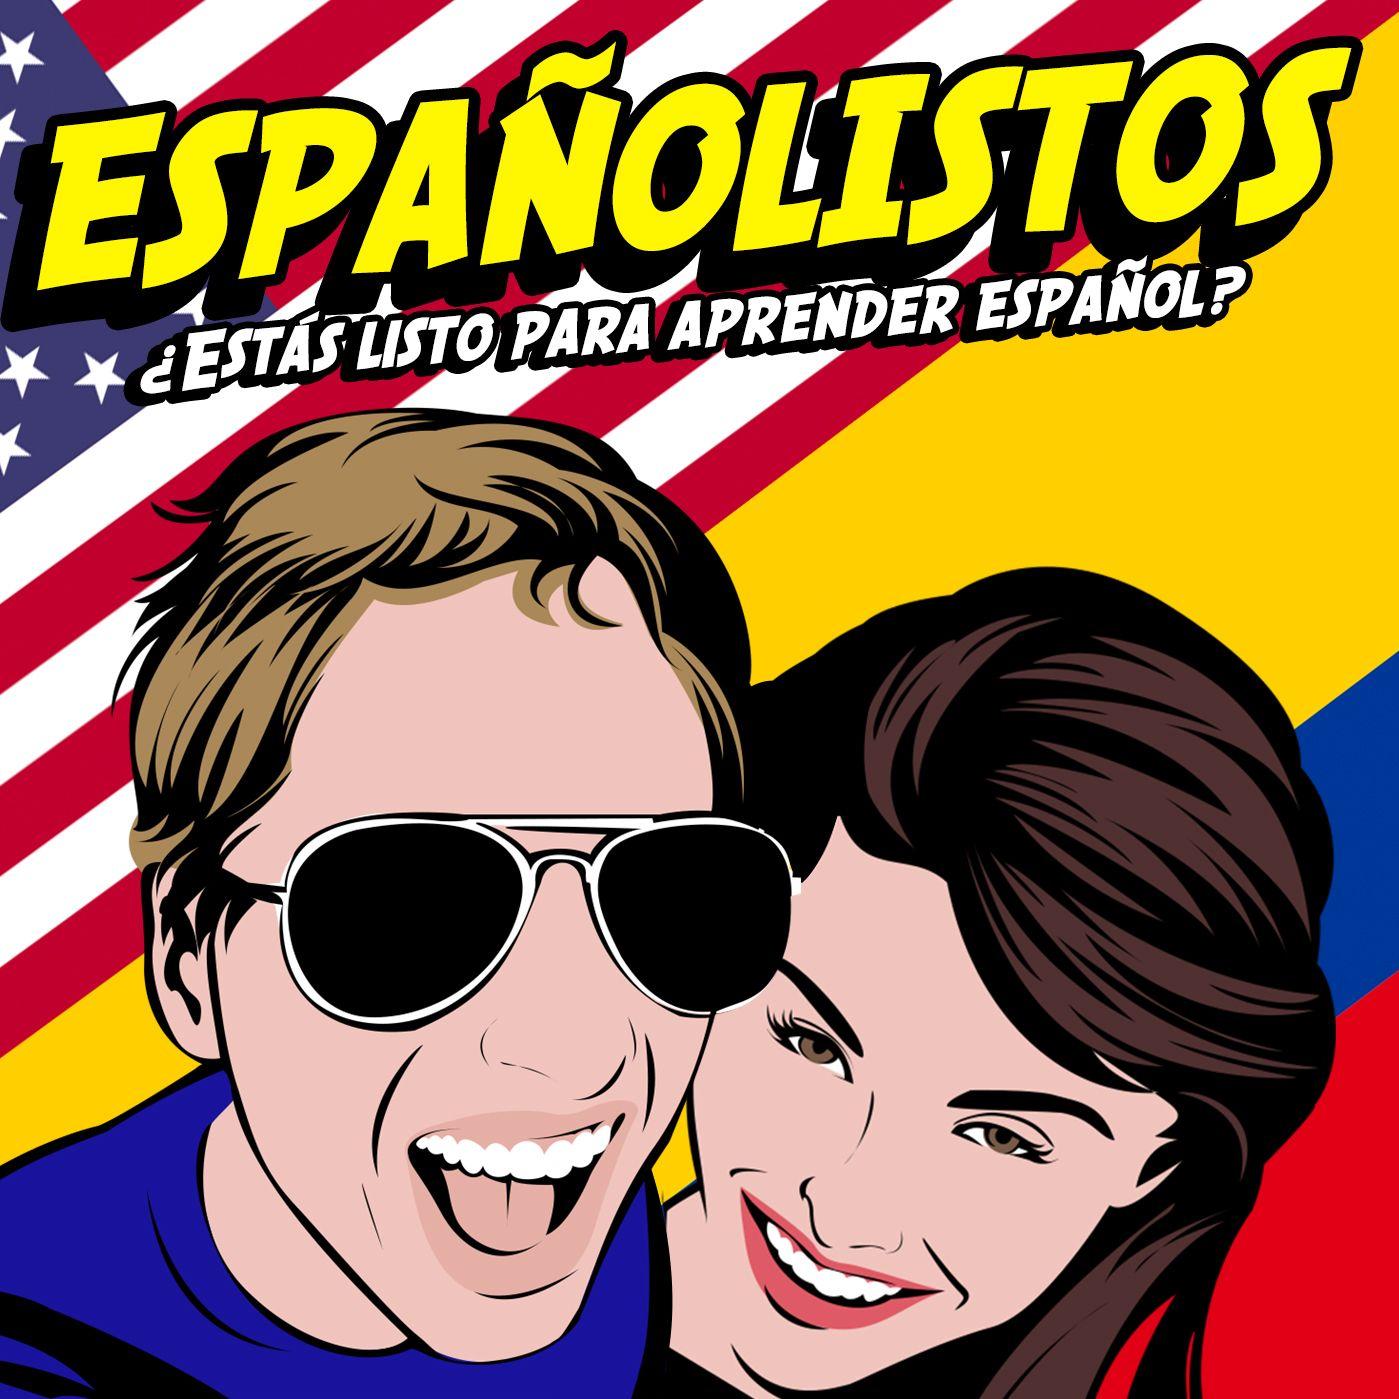 Episodio 110 - 12 Datos Curiosos de Latinoamérica [Parte 1]